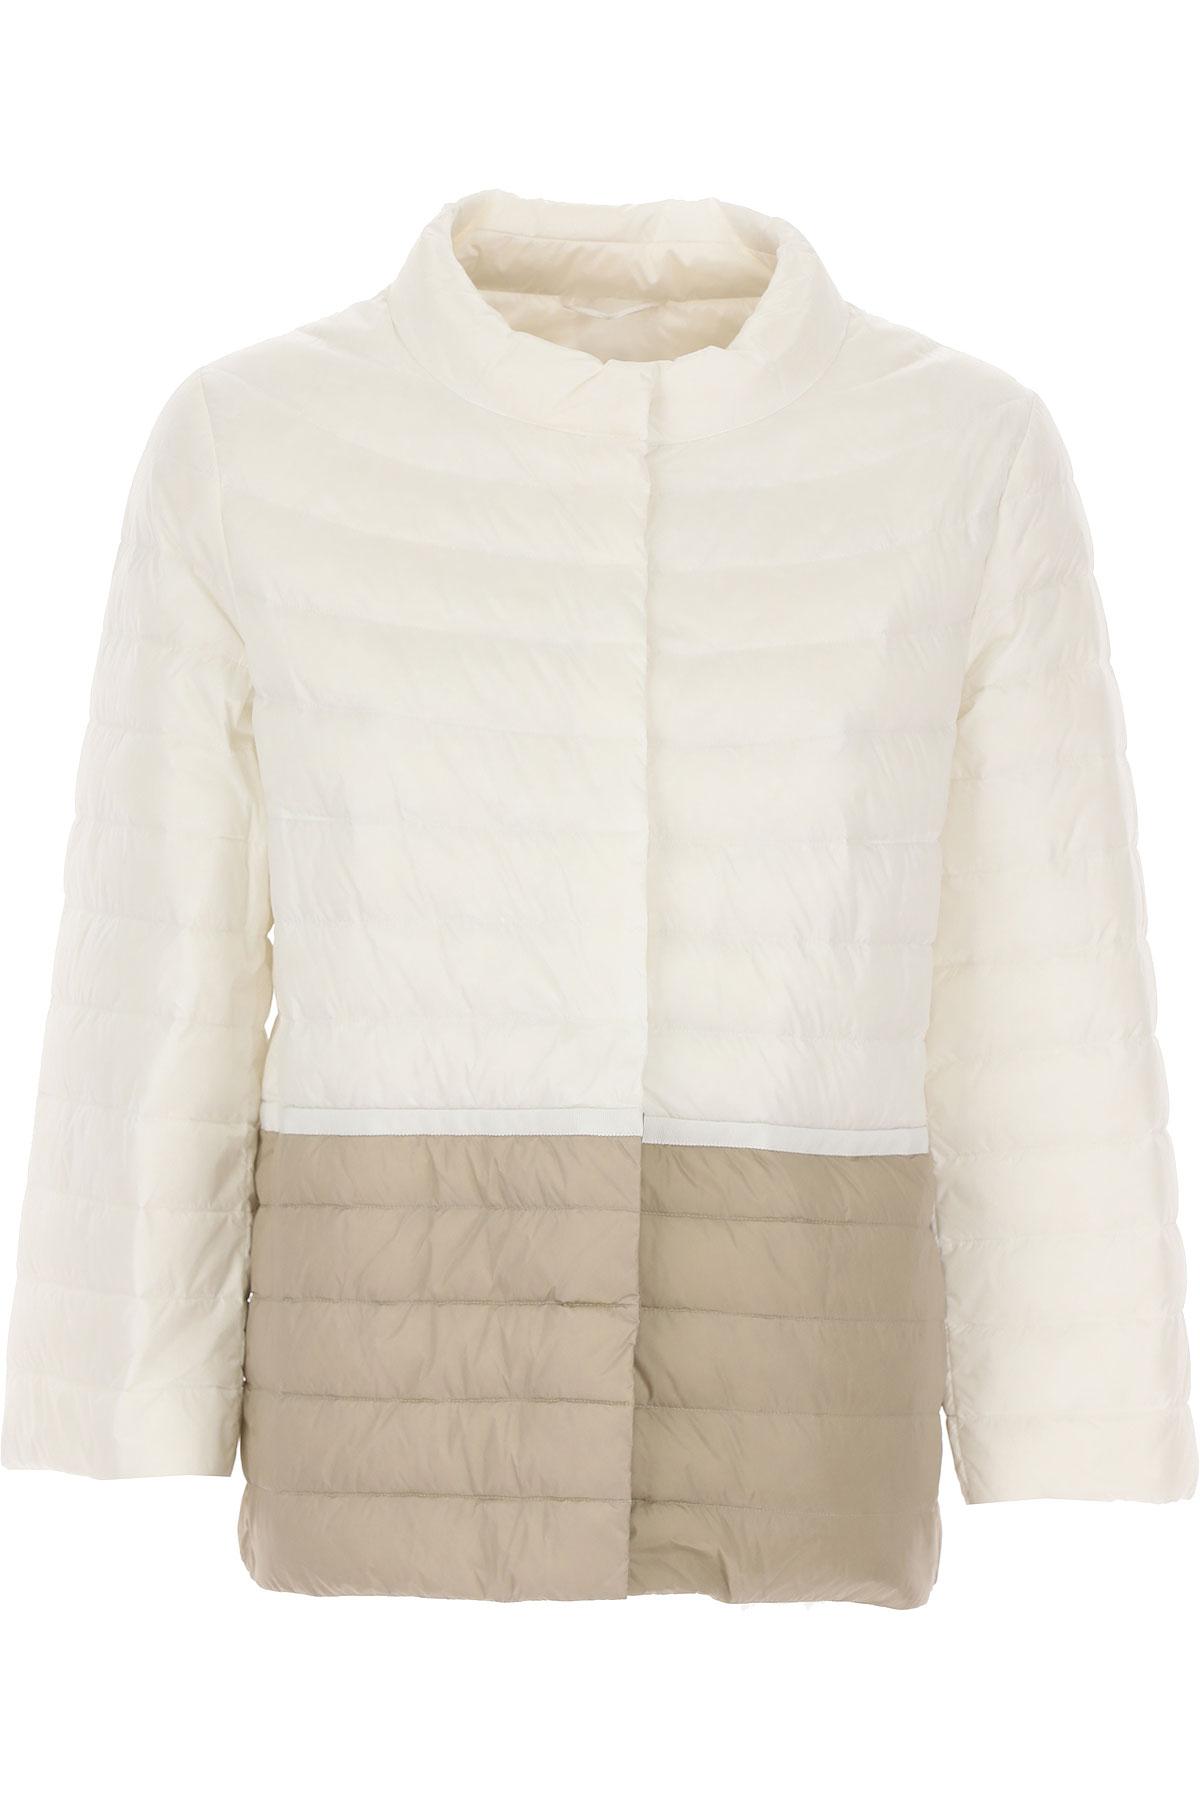 ADD Down Jacket for Women, Puffer Ski Jacket On Sale, Ecru, polyamide, 2019, 10 12 6 8